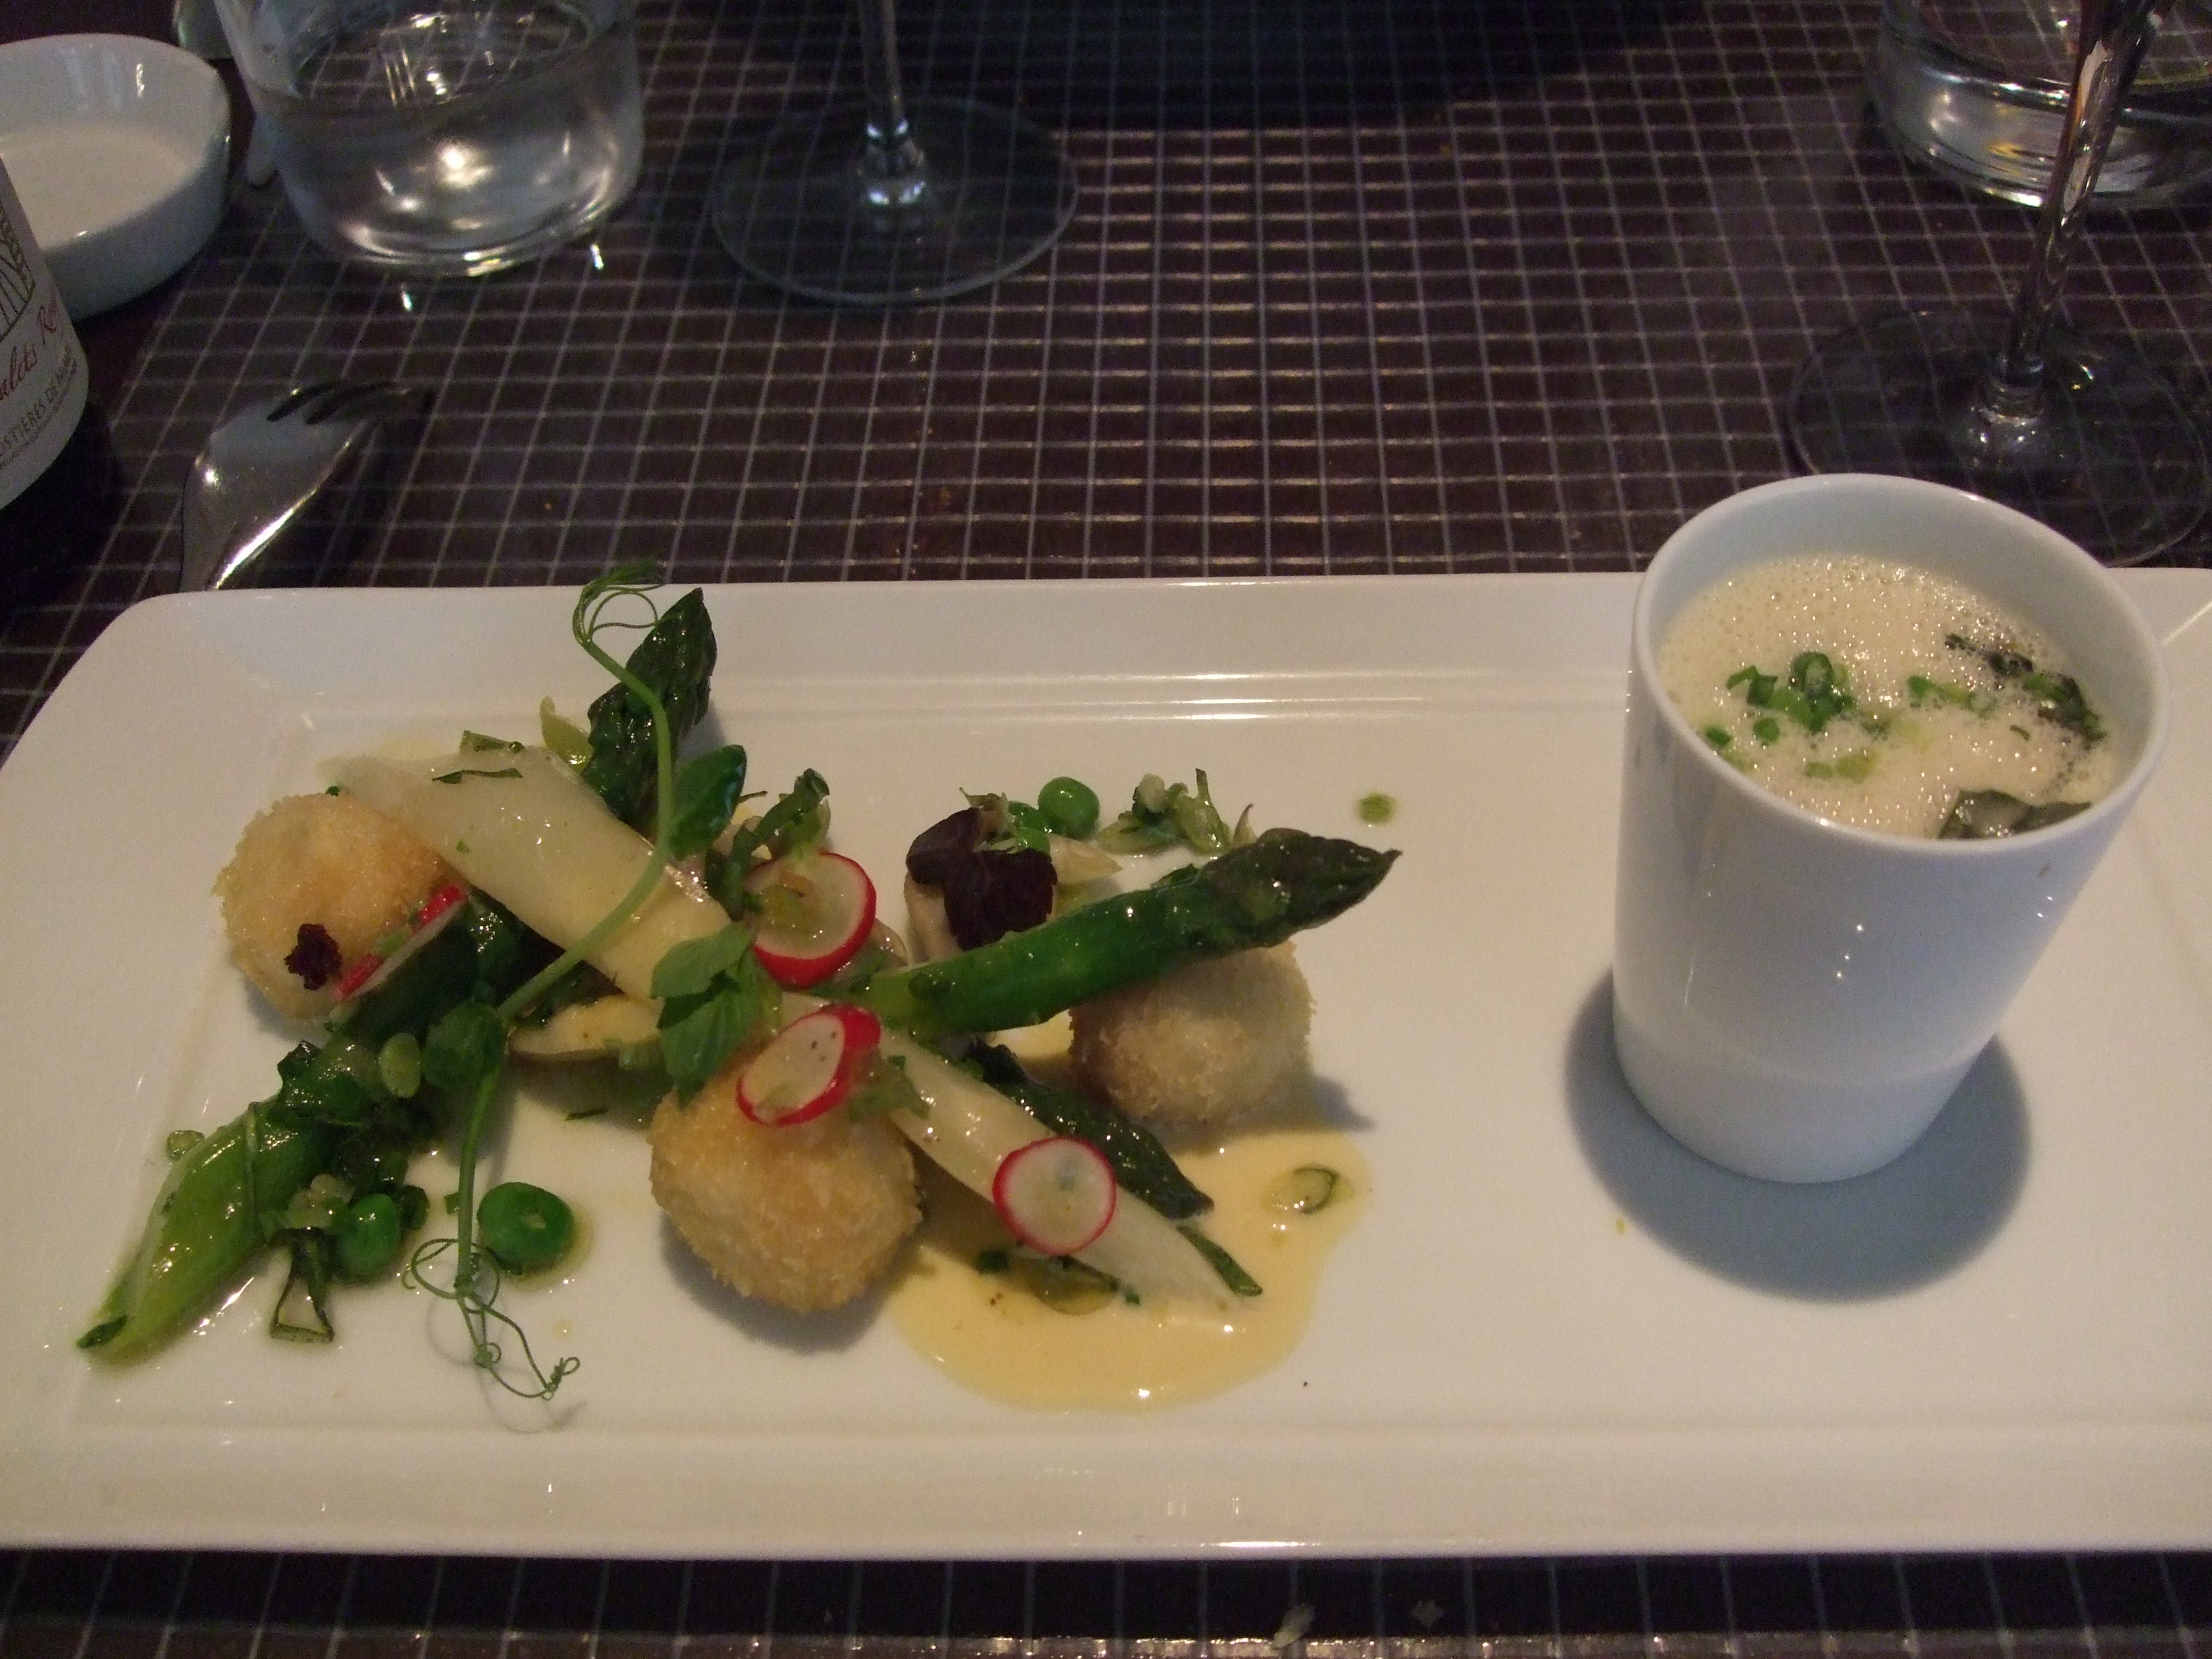 John talbott ze kitchen galerie paris restaurant paris for Ze kitchen galerie paris france